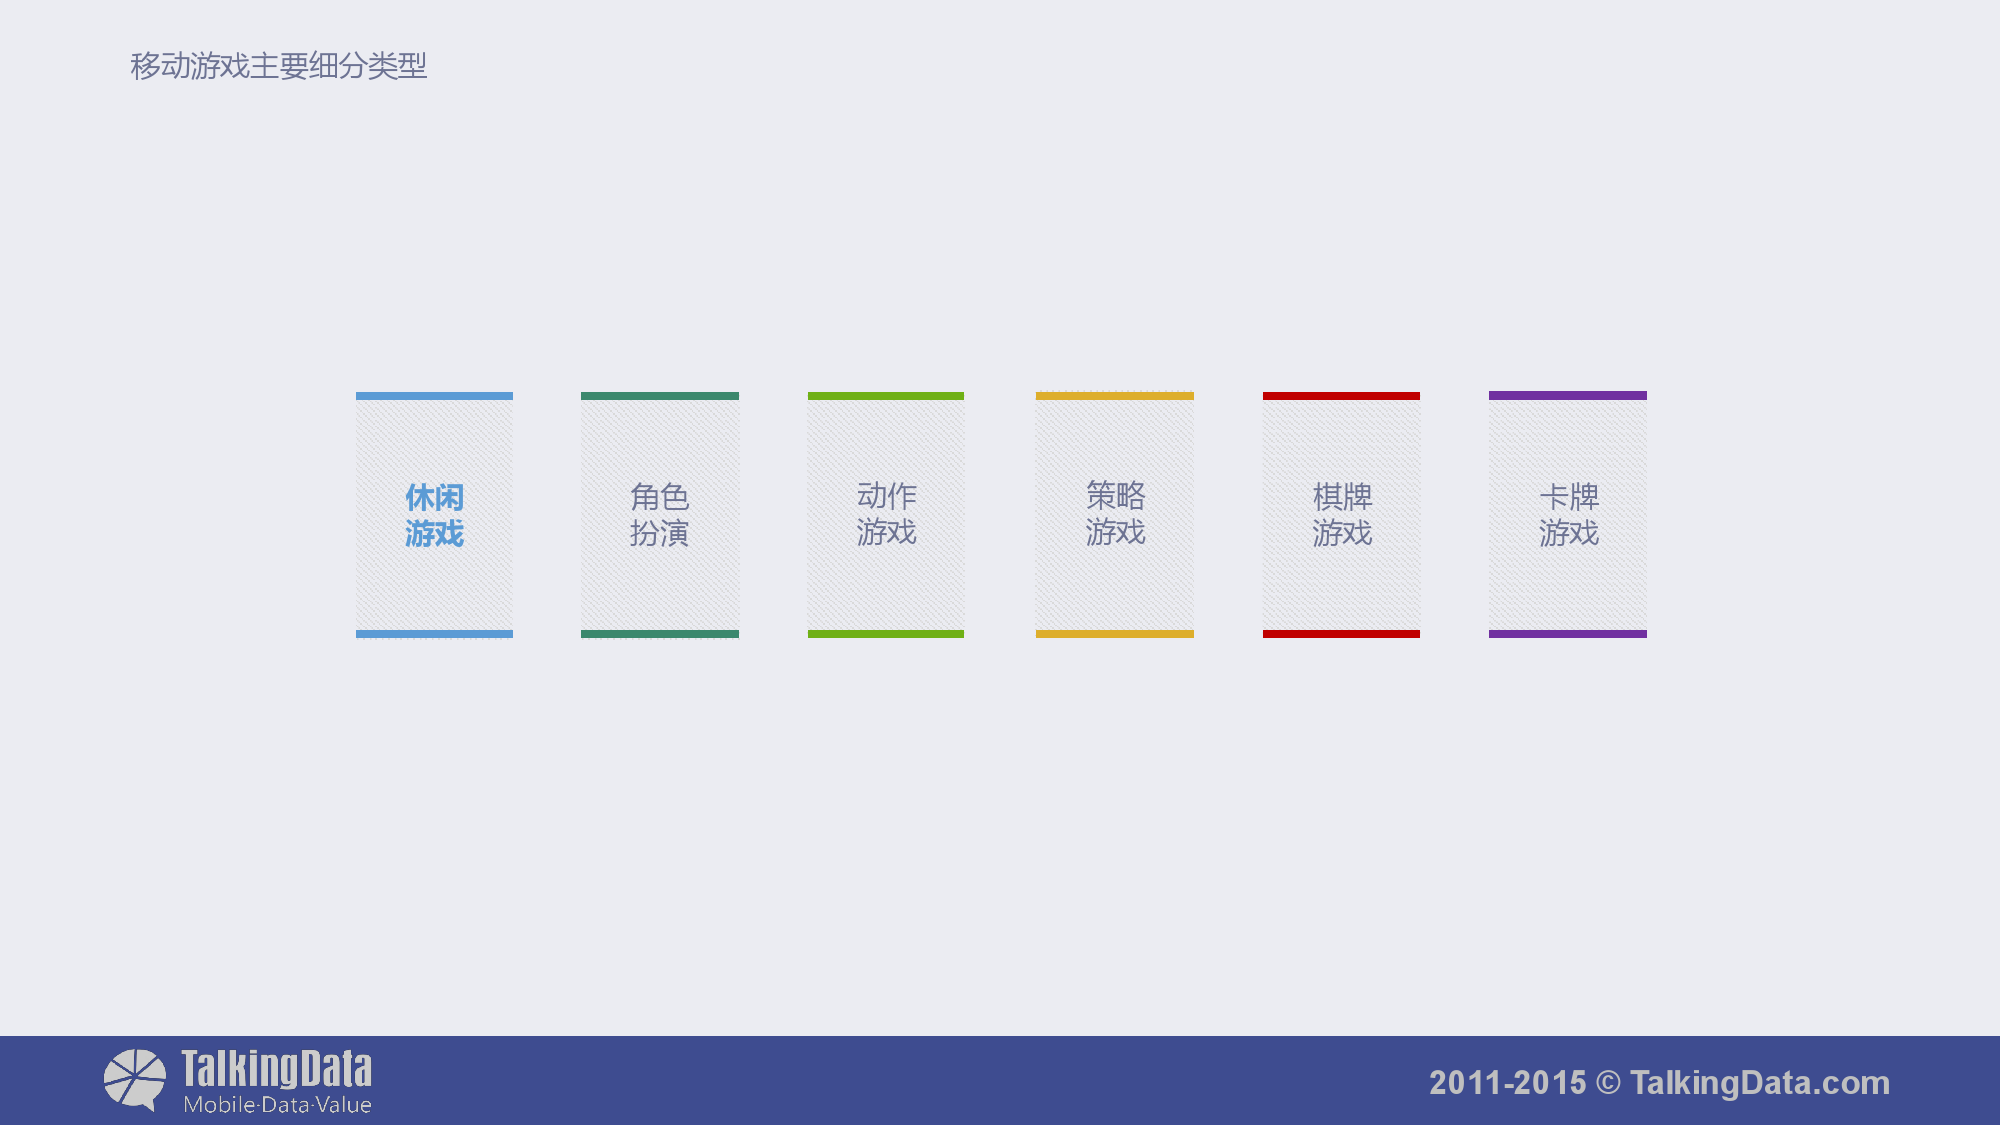 TalkingData-2015年移动游戏行业报告_000035